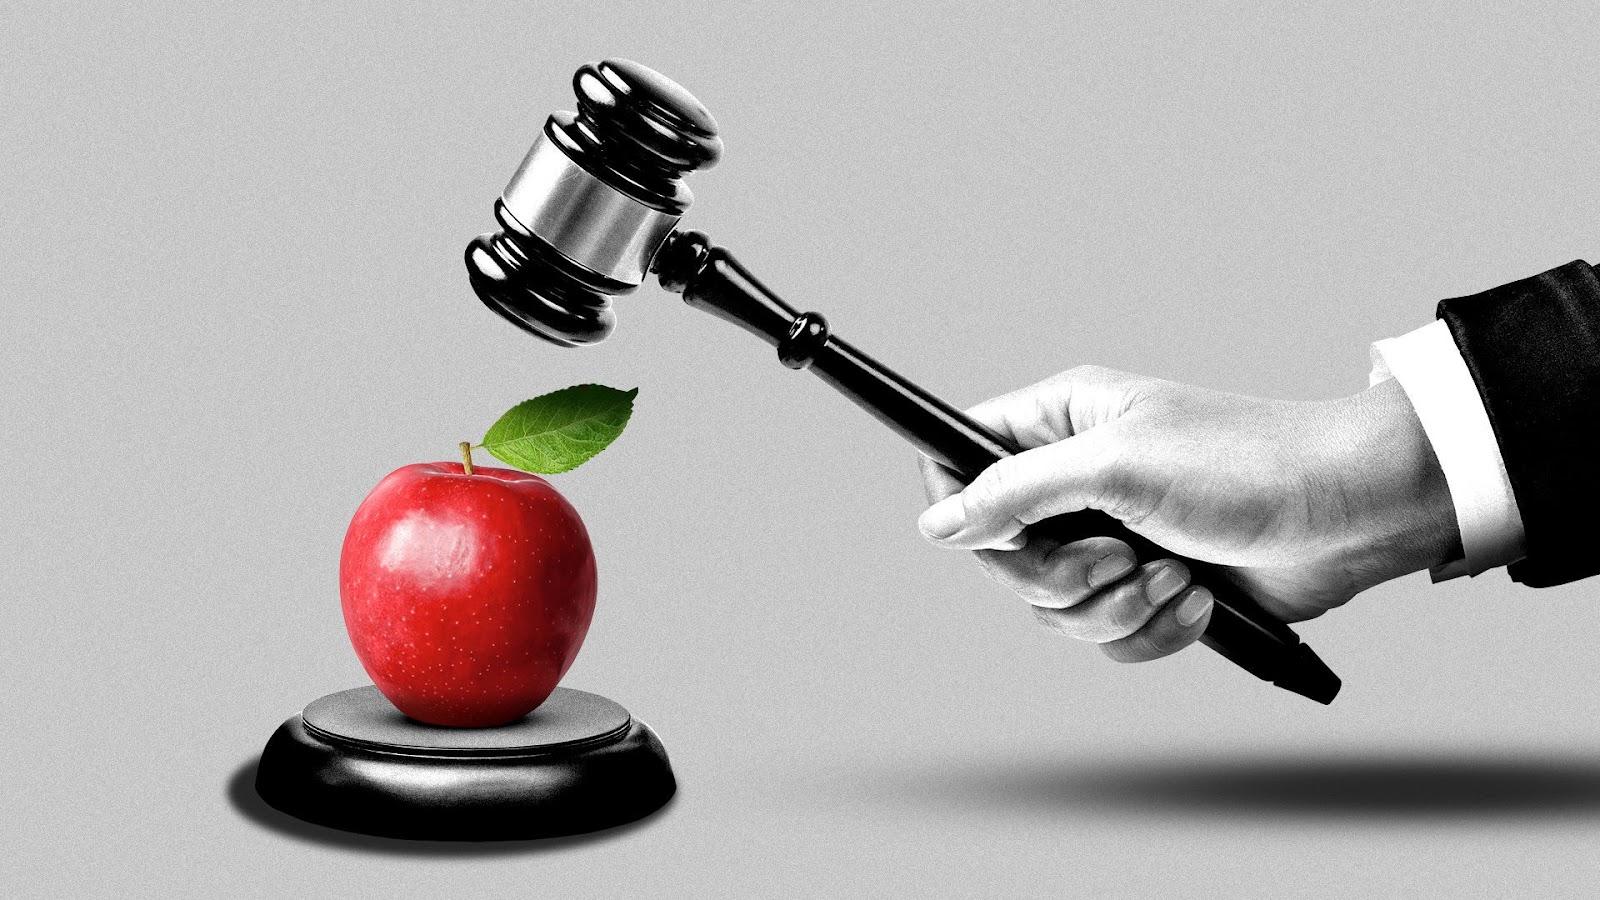 Apple's antitrust fight turns Epic - Axios